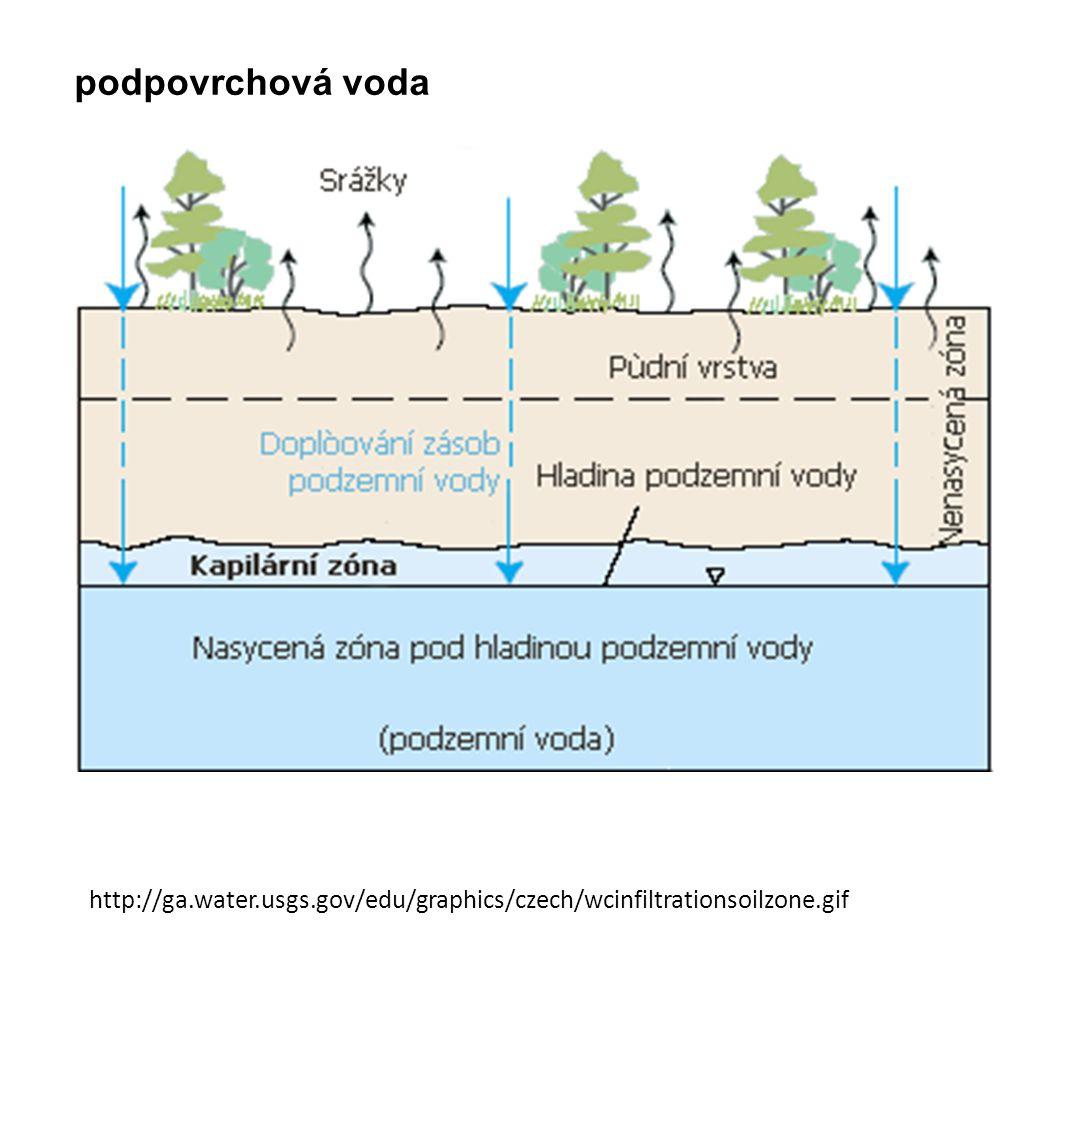 http://ga.water.usgs.gov/edu/graphics/czech/wcinfiltrationsoilzone.gif podpovrchová voda